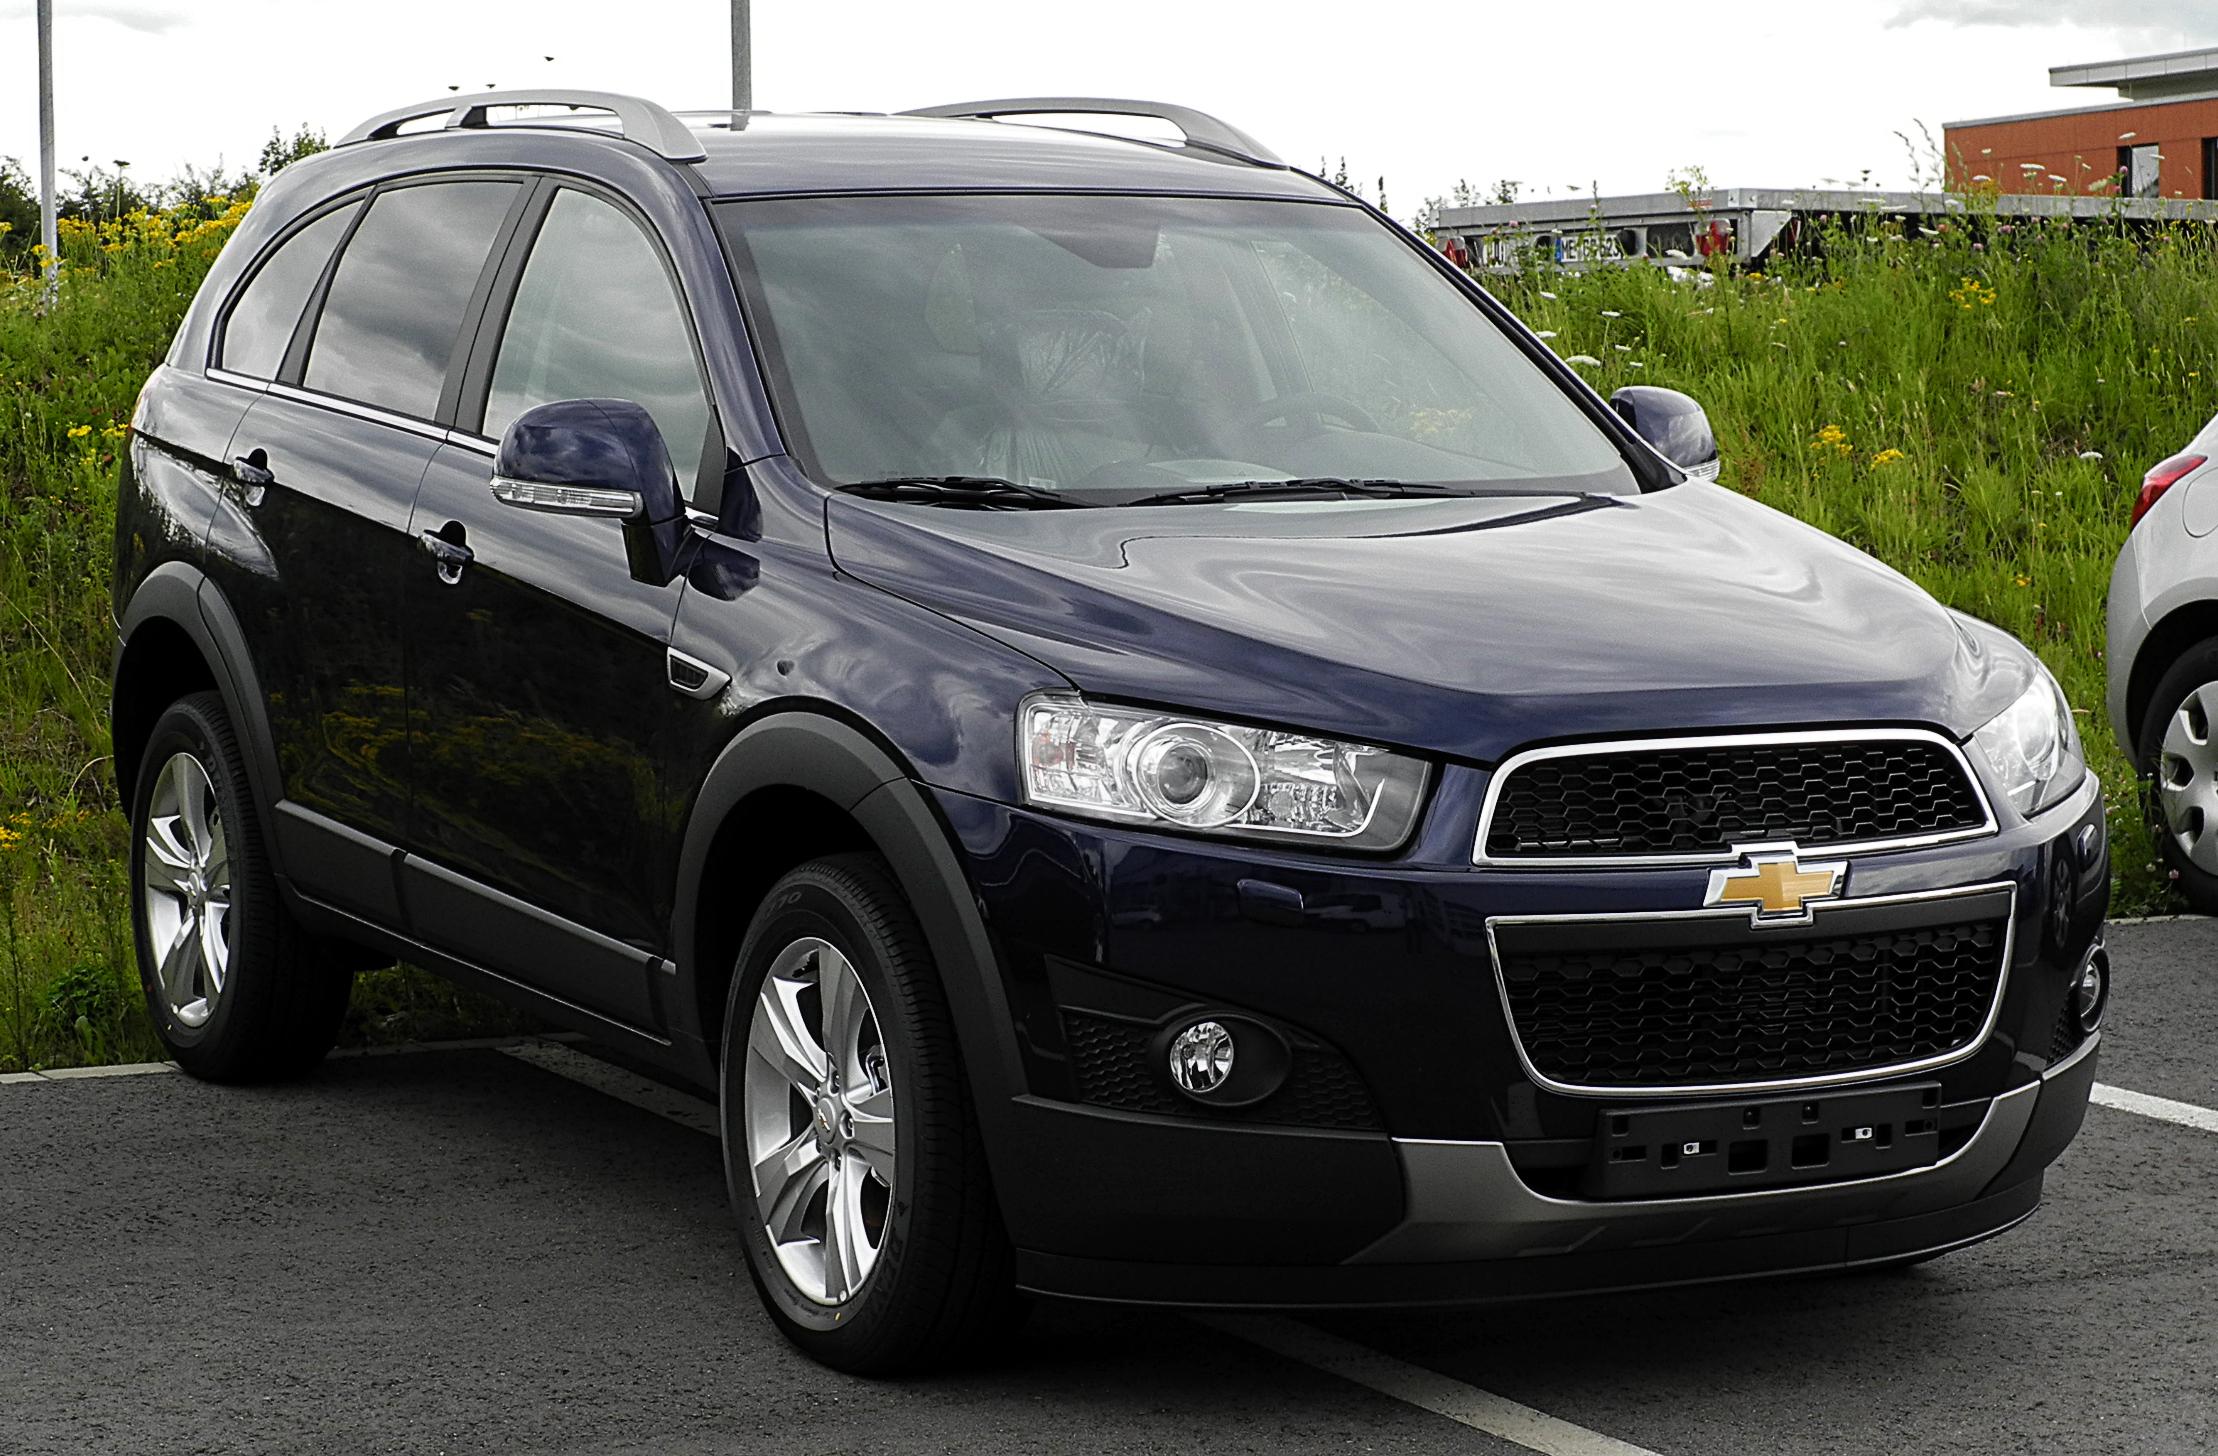 Description Chevrolet Captiva (Facelift) – Frontansicht, 17. Juli